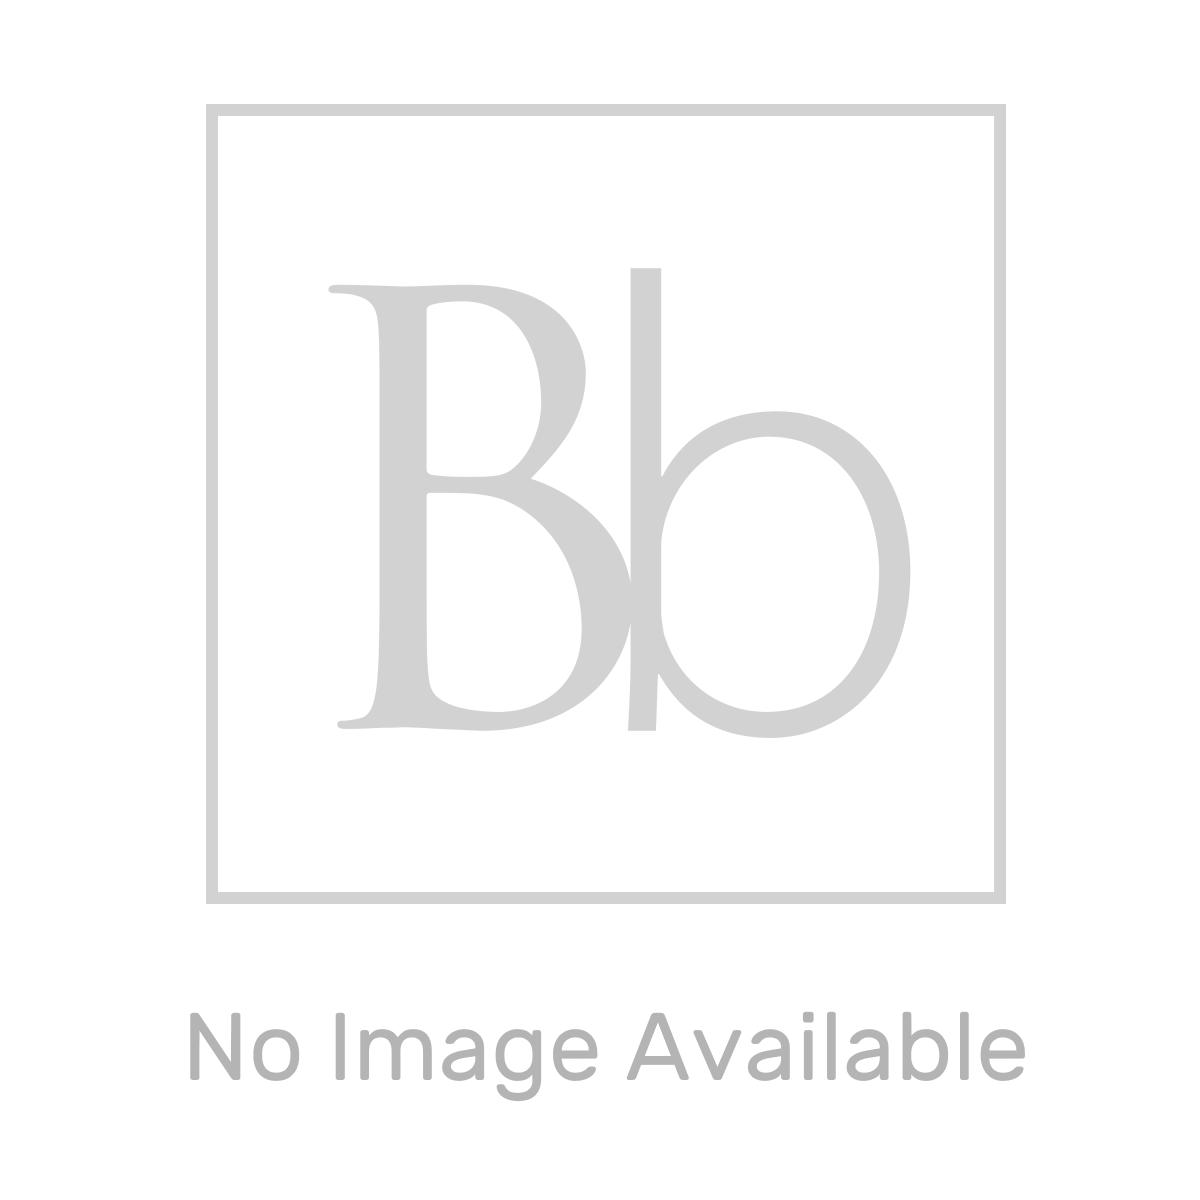 Moods Versa LED Battery Mirror 500x390